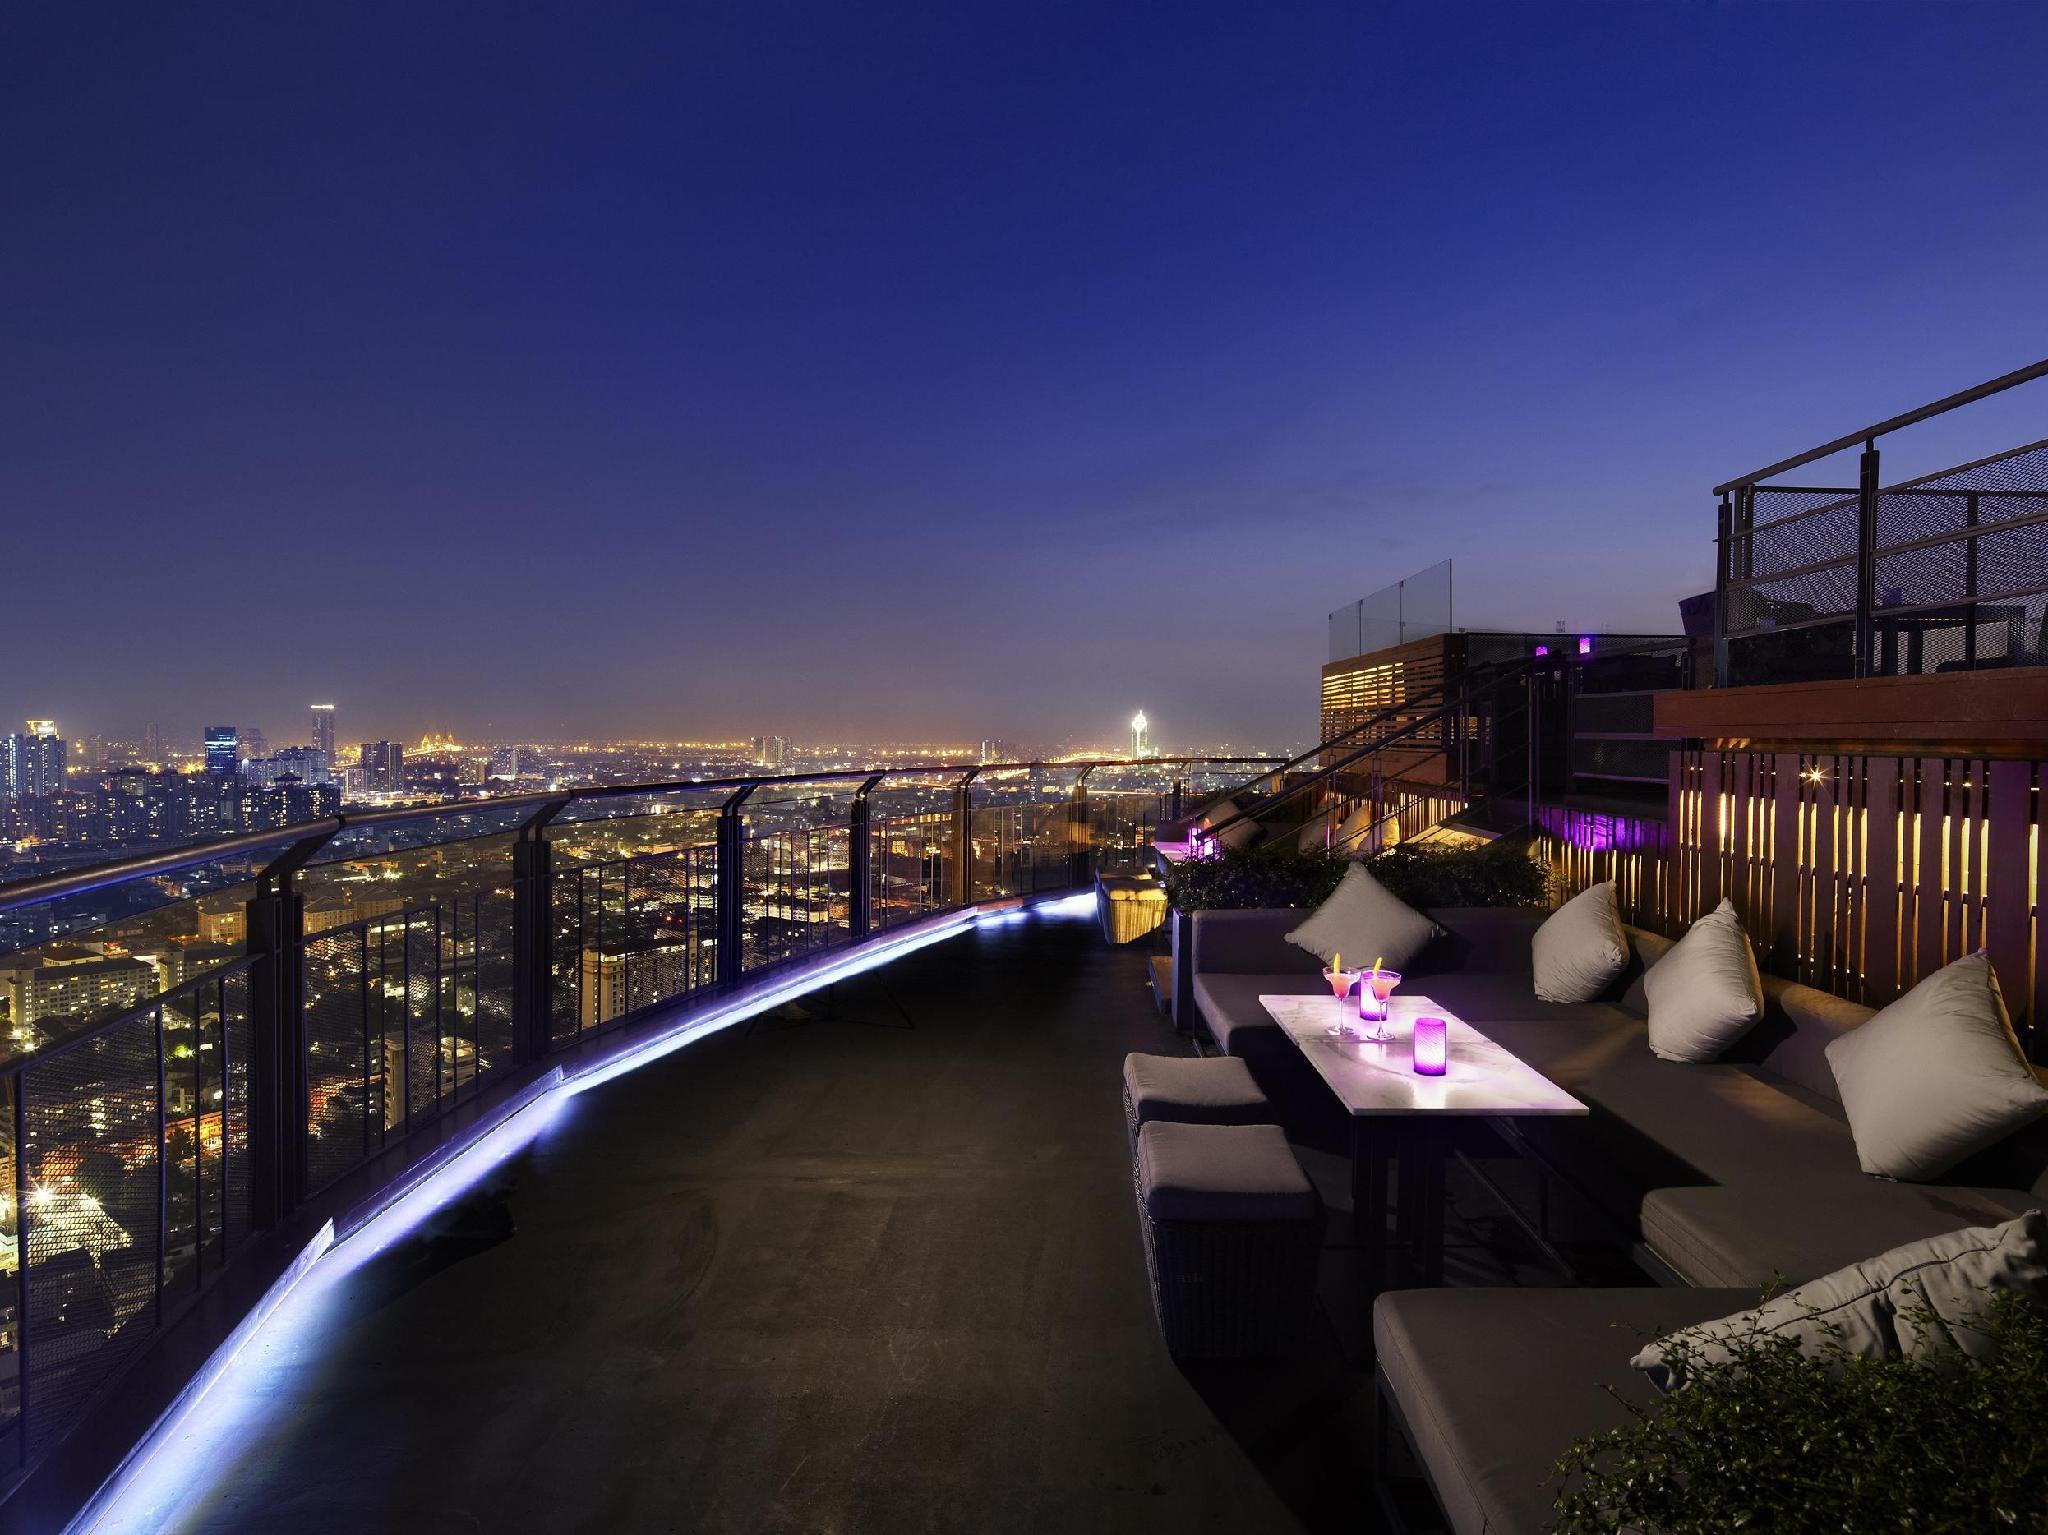 Anantara Sathorn Bangkok Hotel - Hotels and Accommodation in Thailand, Asia